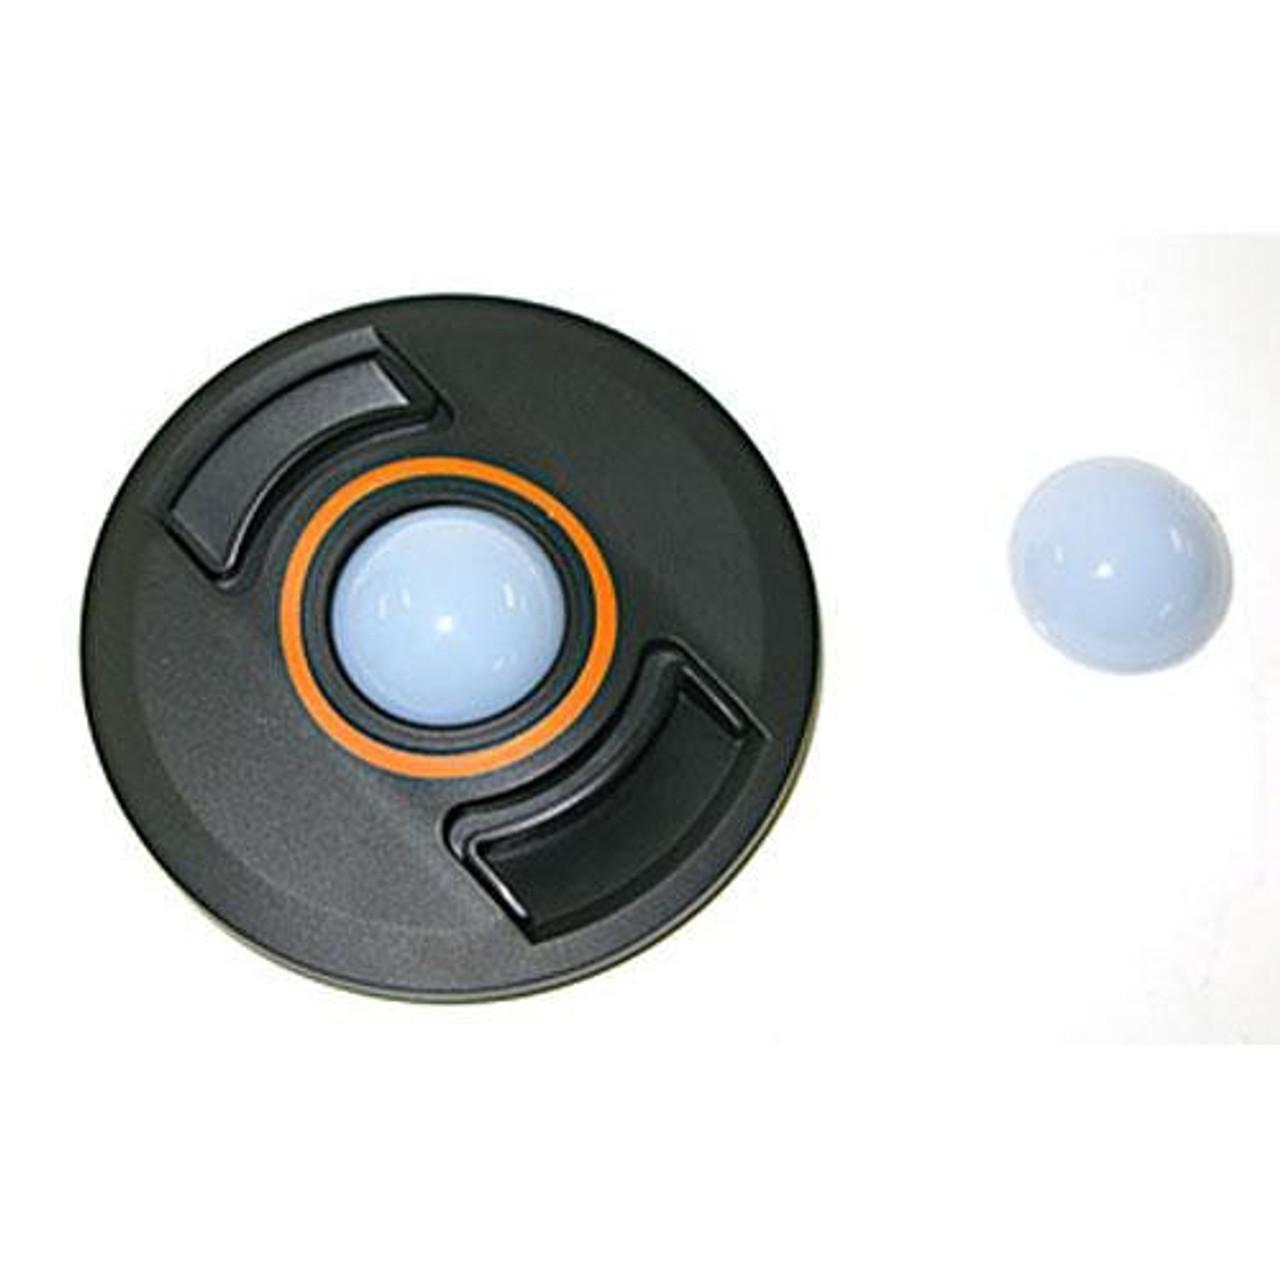 BaLens 62mm White Balance Lens Cap